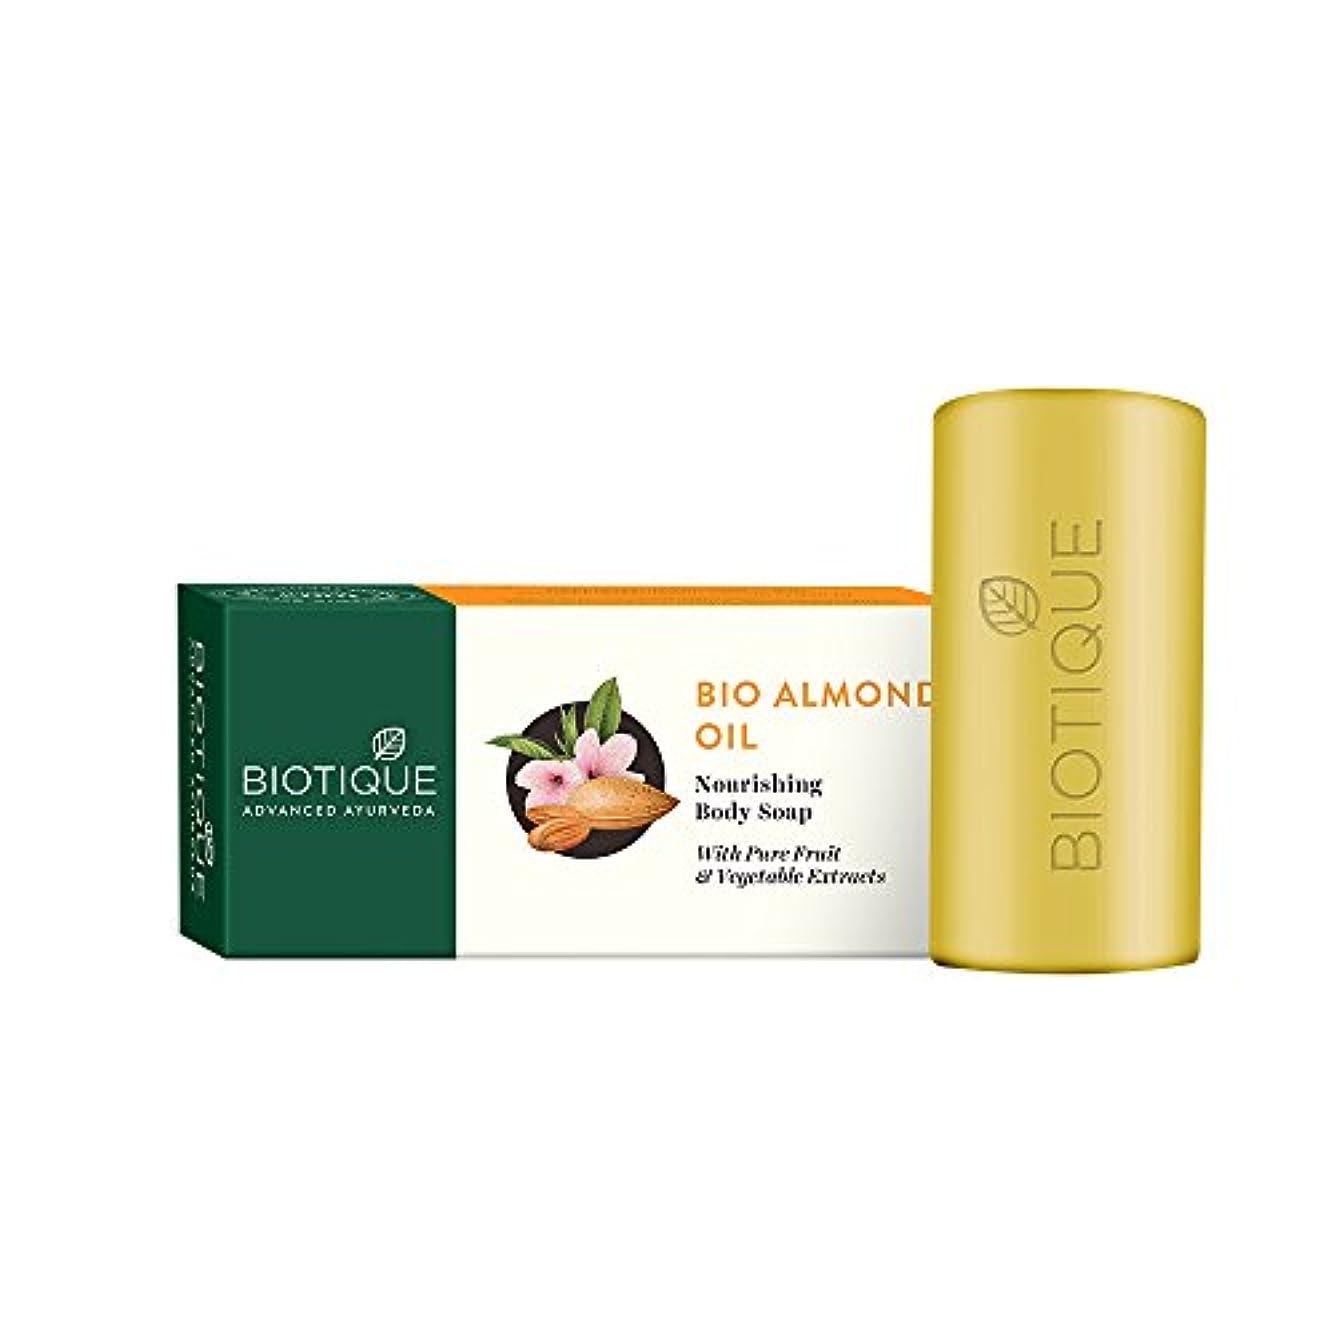 Biotique Pure Vegetable Cleanser - Almond Oil Soap 150g